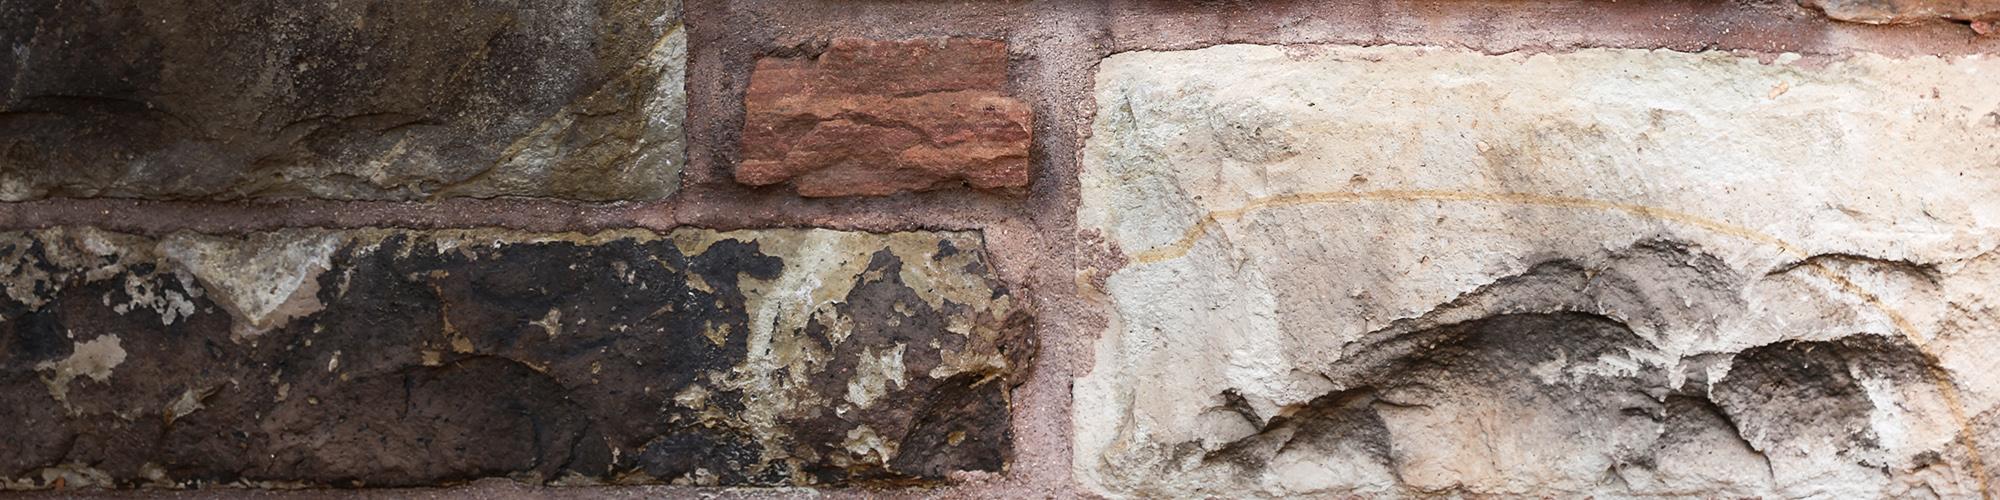 Cornerstones Revisited